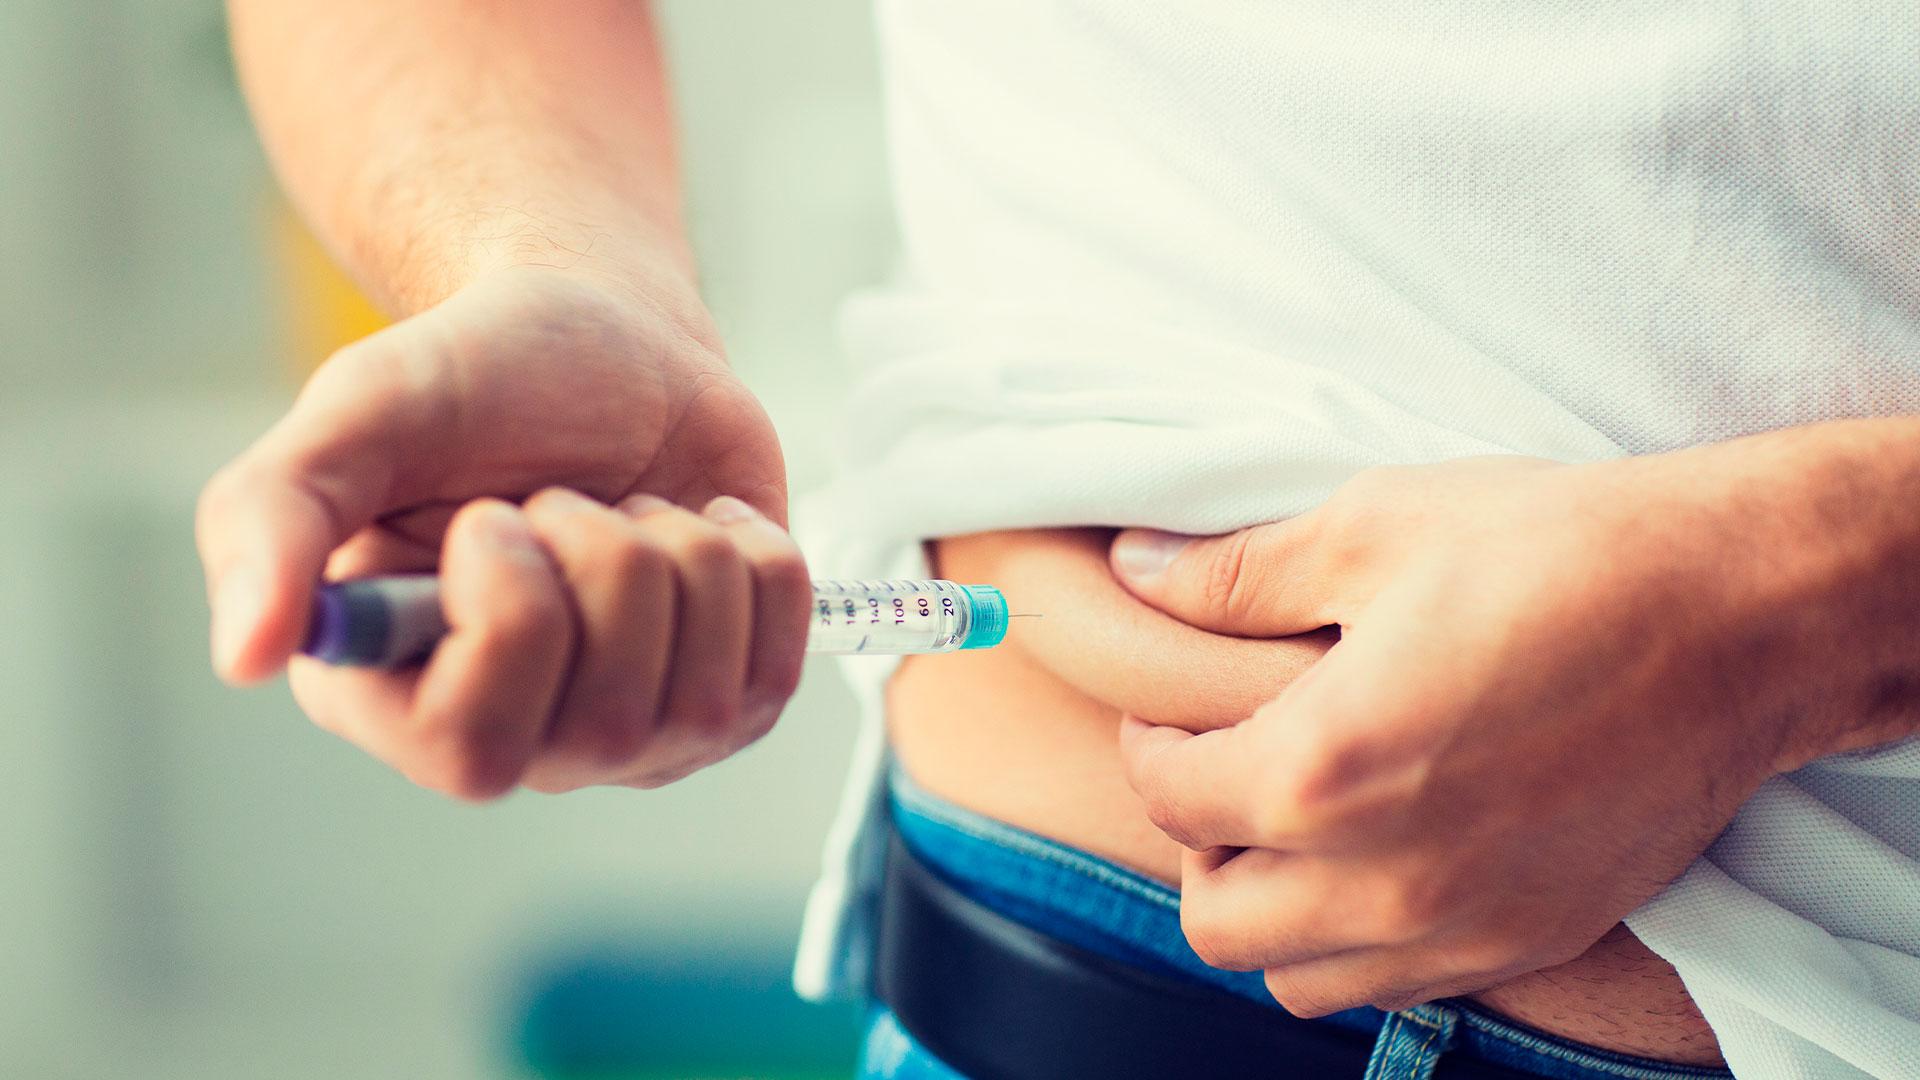 Scoperta una nuova formulazione di insulina ad azione ultrarapida